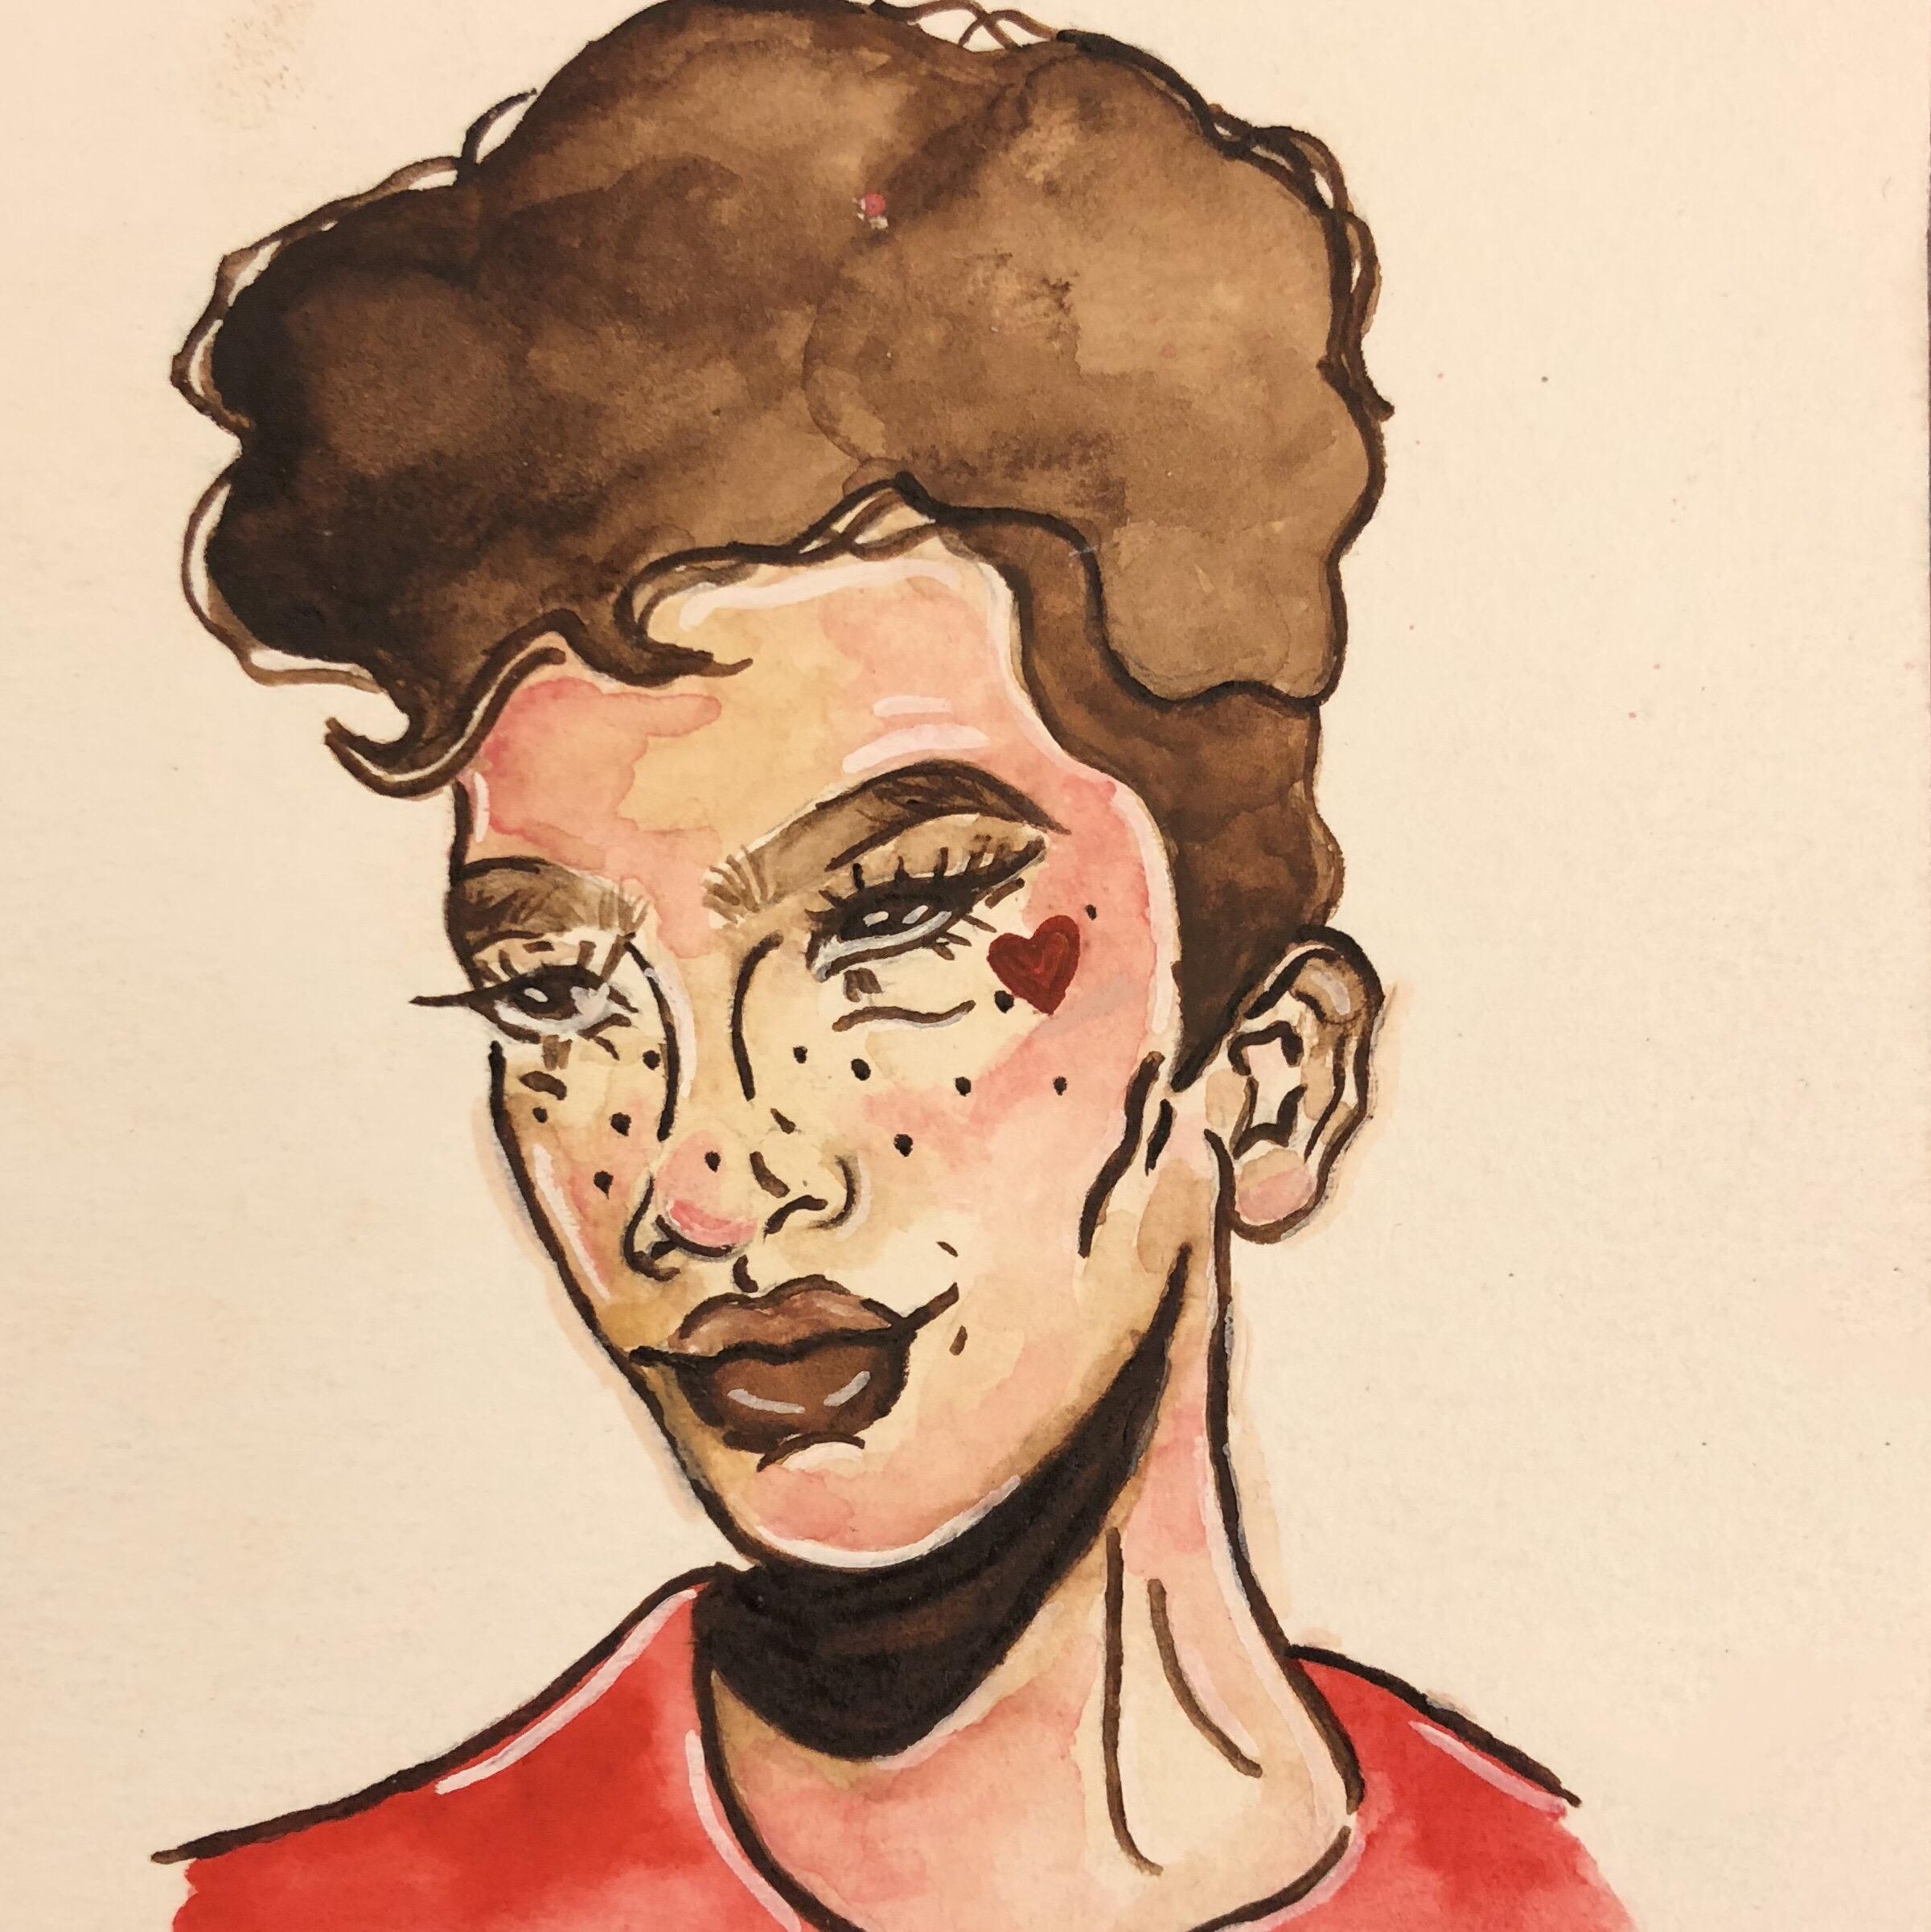 Portrait by Brianna Cunningham